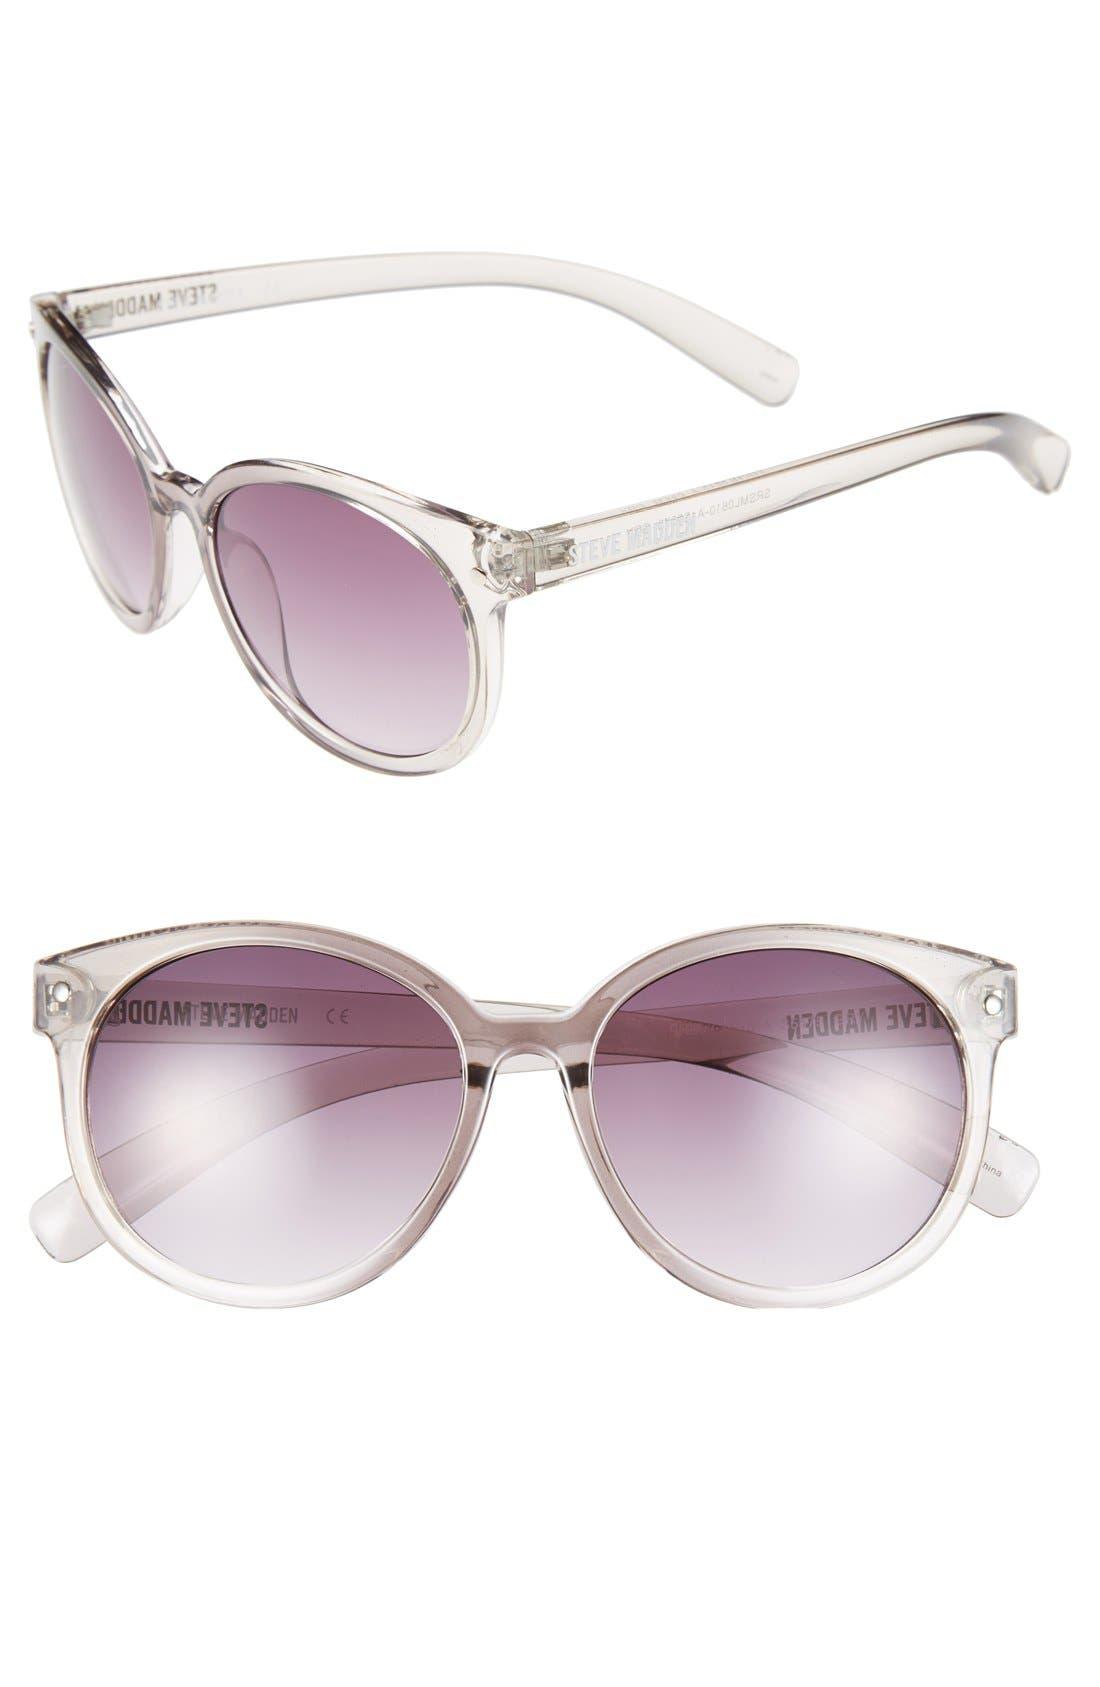 Alternate Image 1 Selected - Steve Madden 'Crystal' 54mm Oval Sunglasses